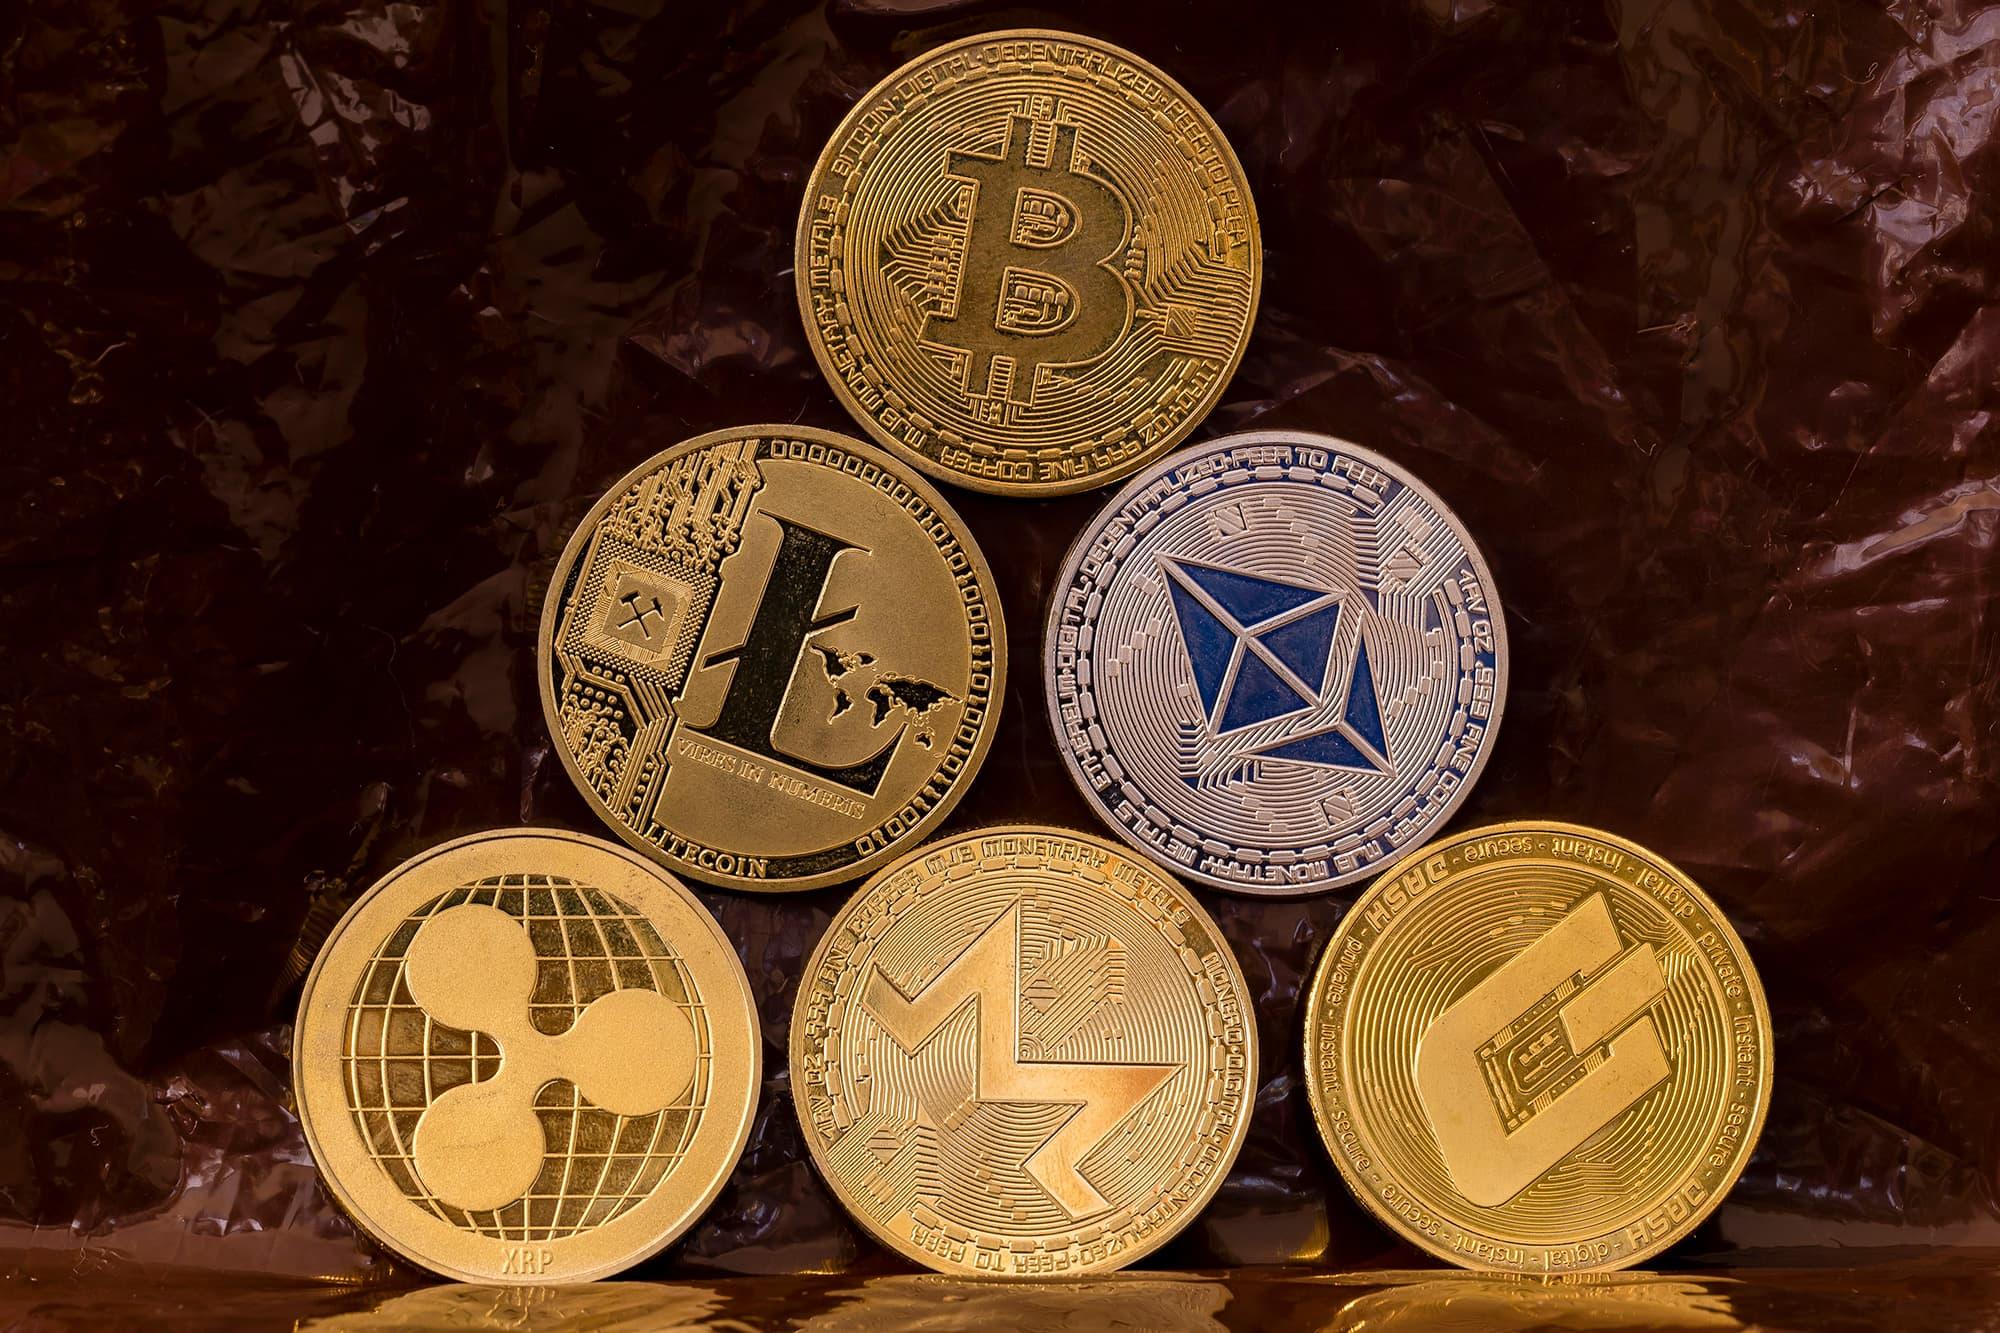 when coinbase add more coins